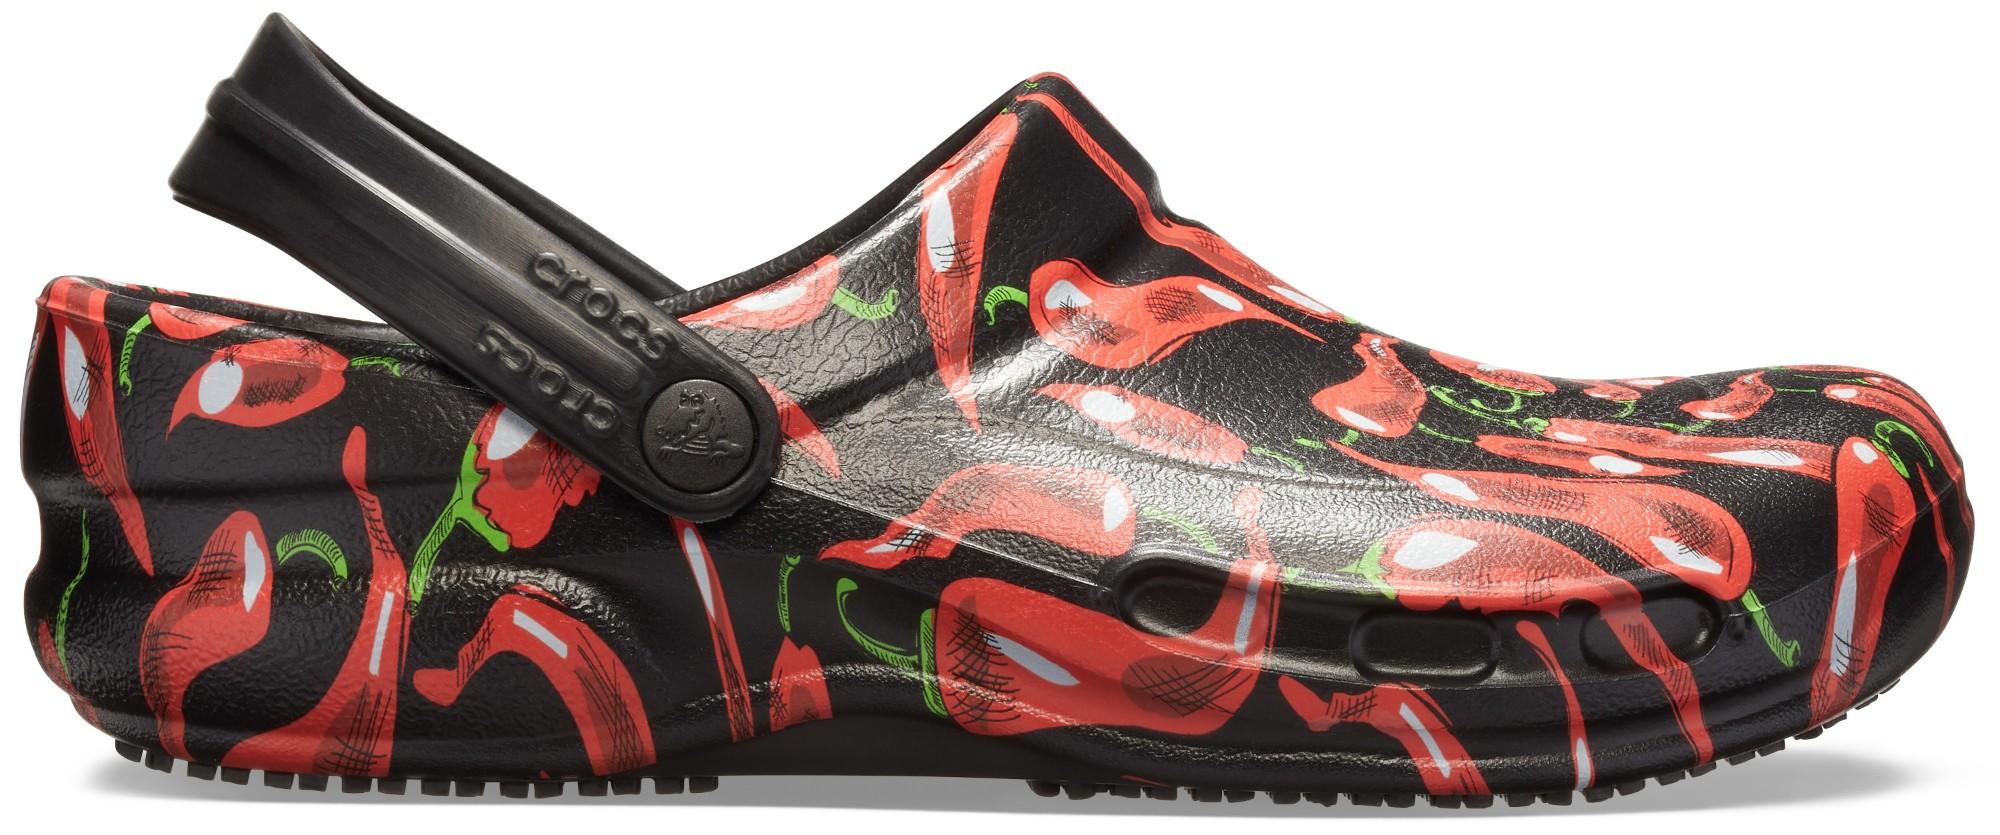 Crocs™ Bistro Peppers Clog Black/Red 45,5